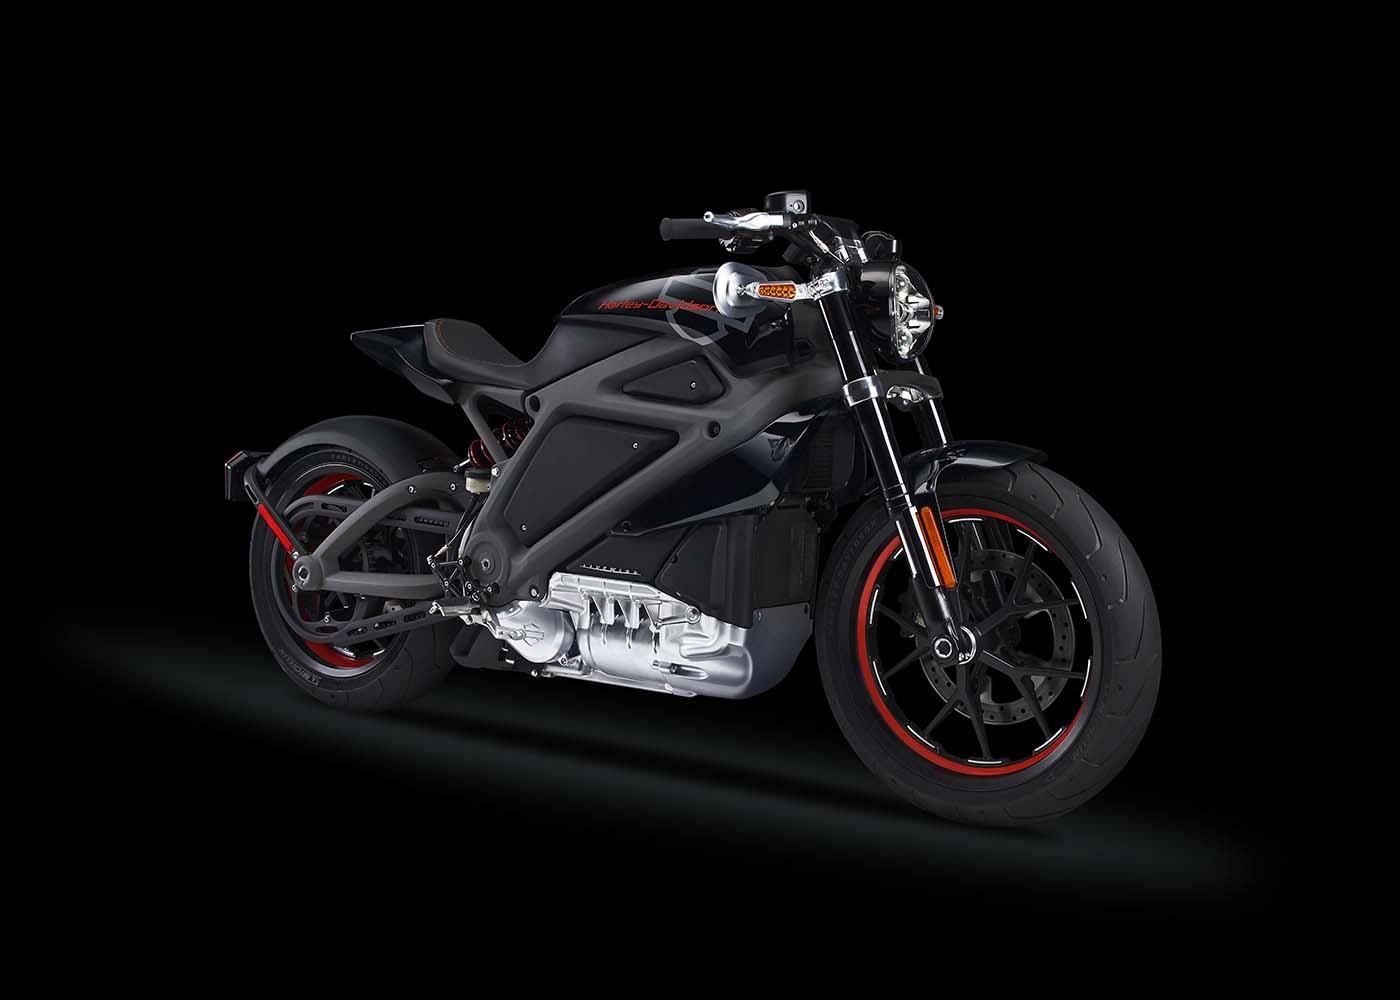 La sportive verte du futur - Page 15 Harley-Davidson-Livewire-electric-motorcycle-12